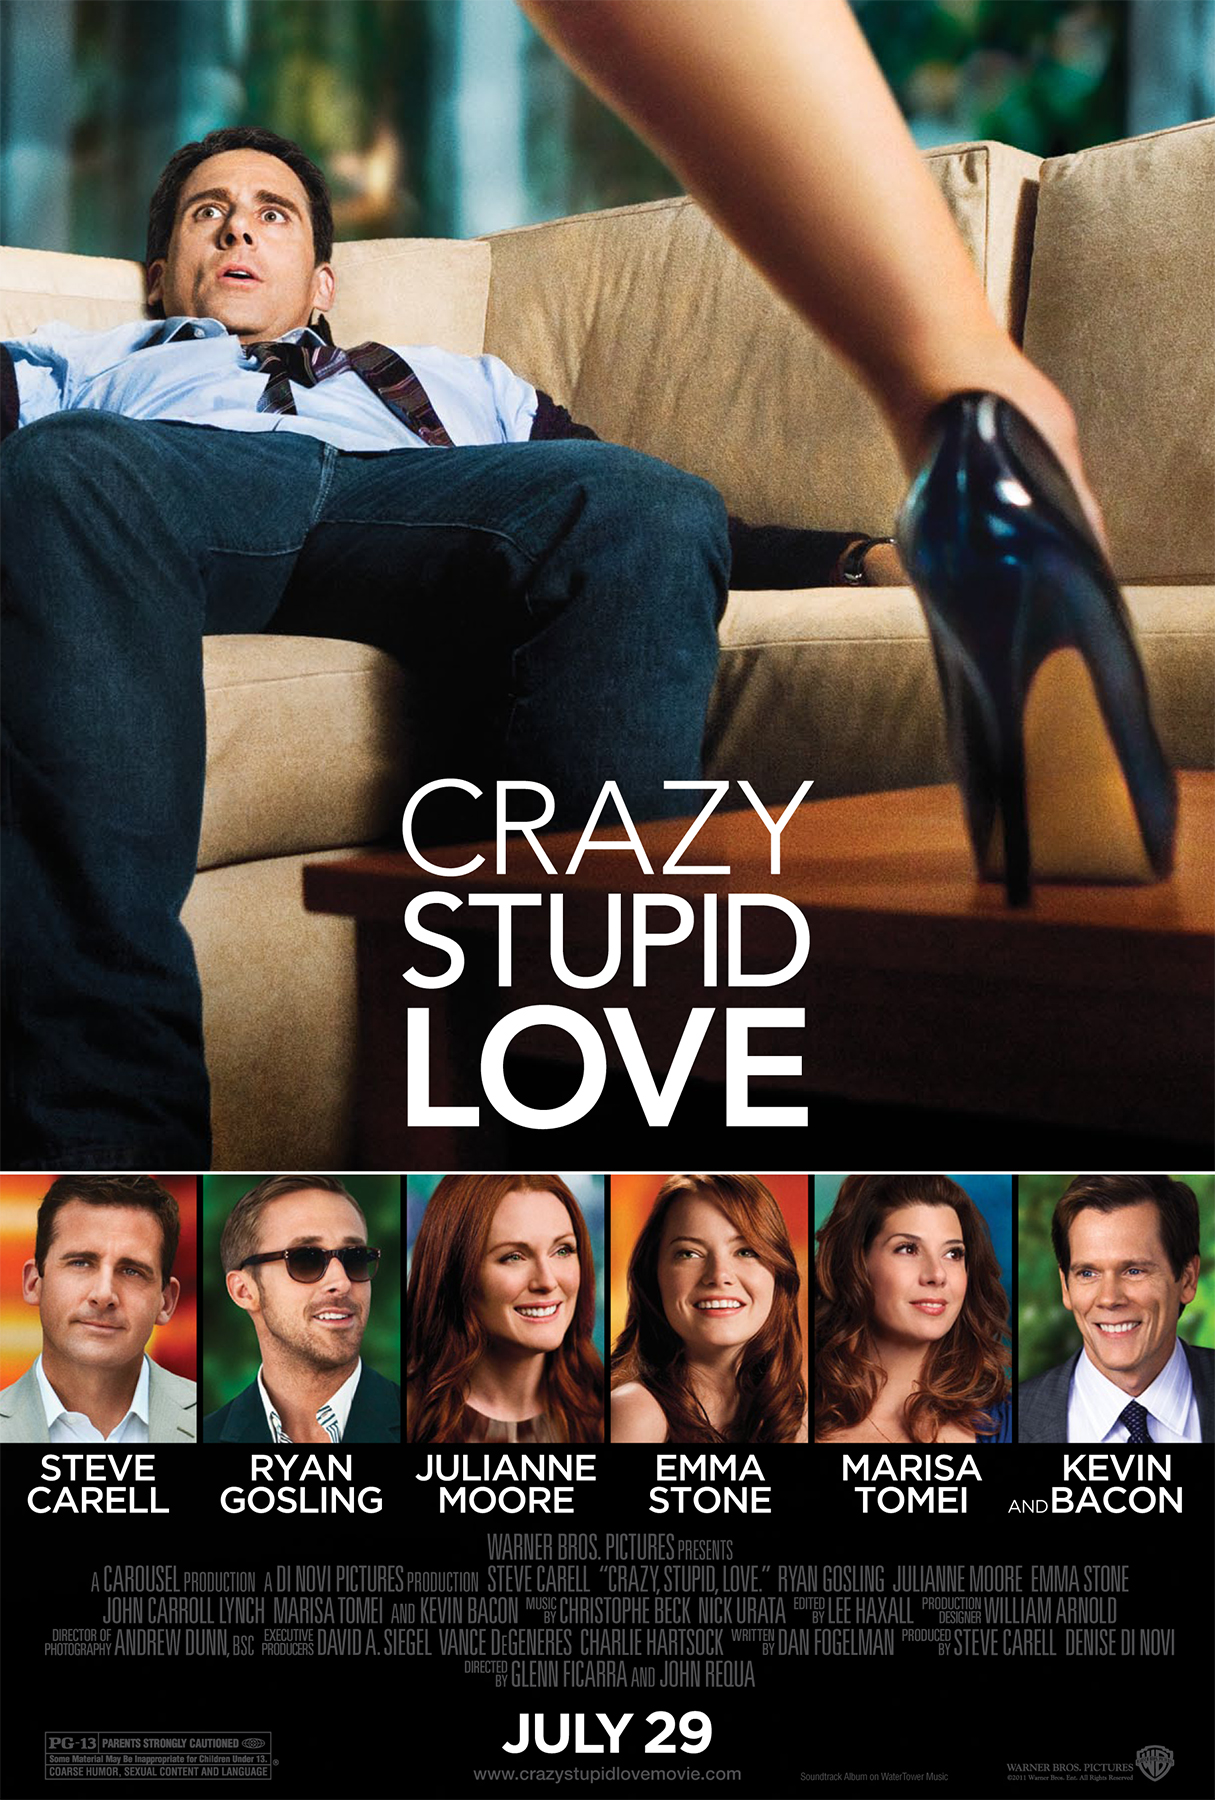 crazy-stupid-love-movie-poster1.jpg